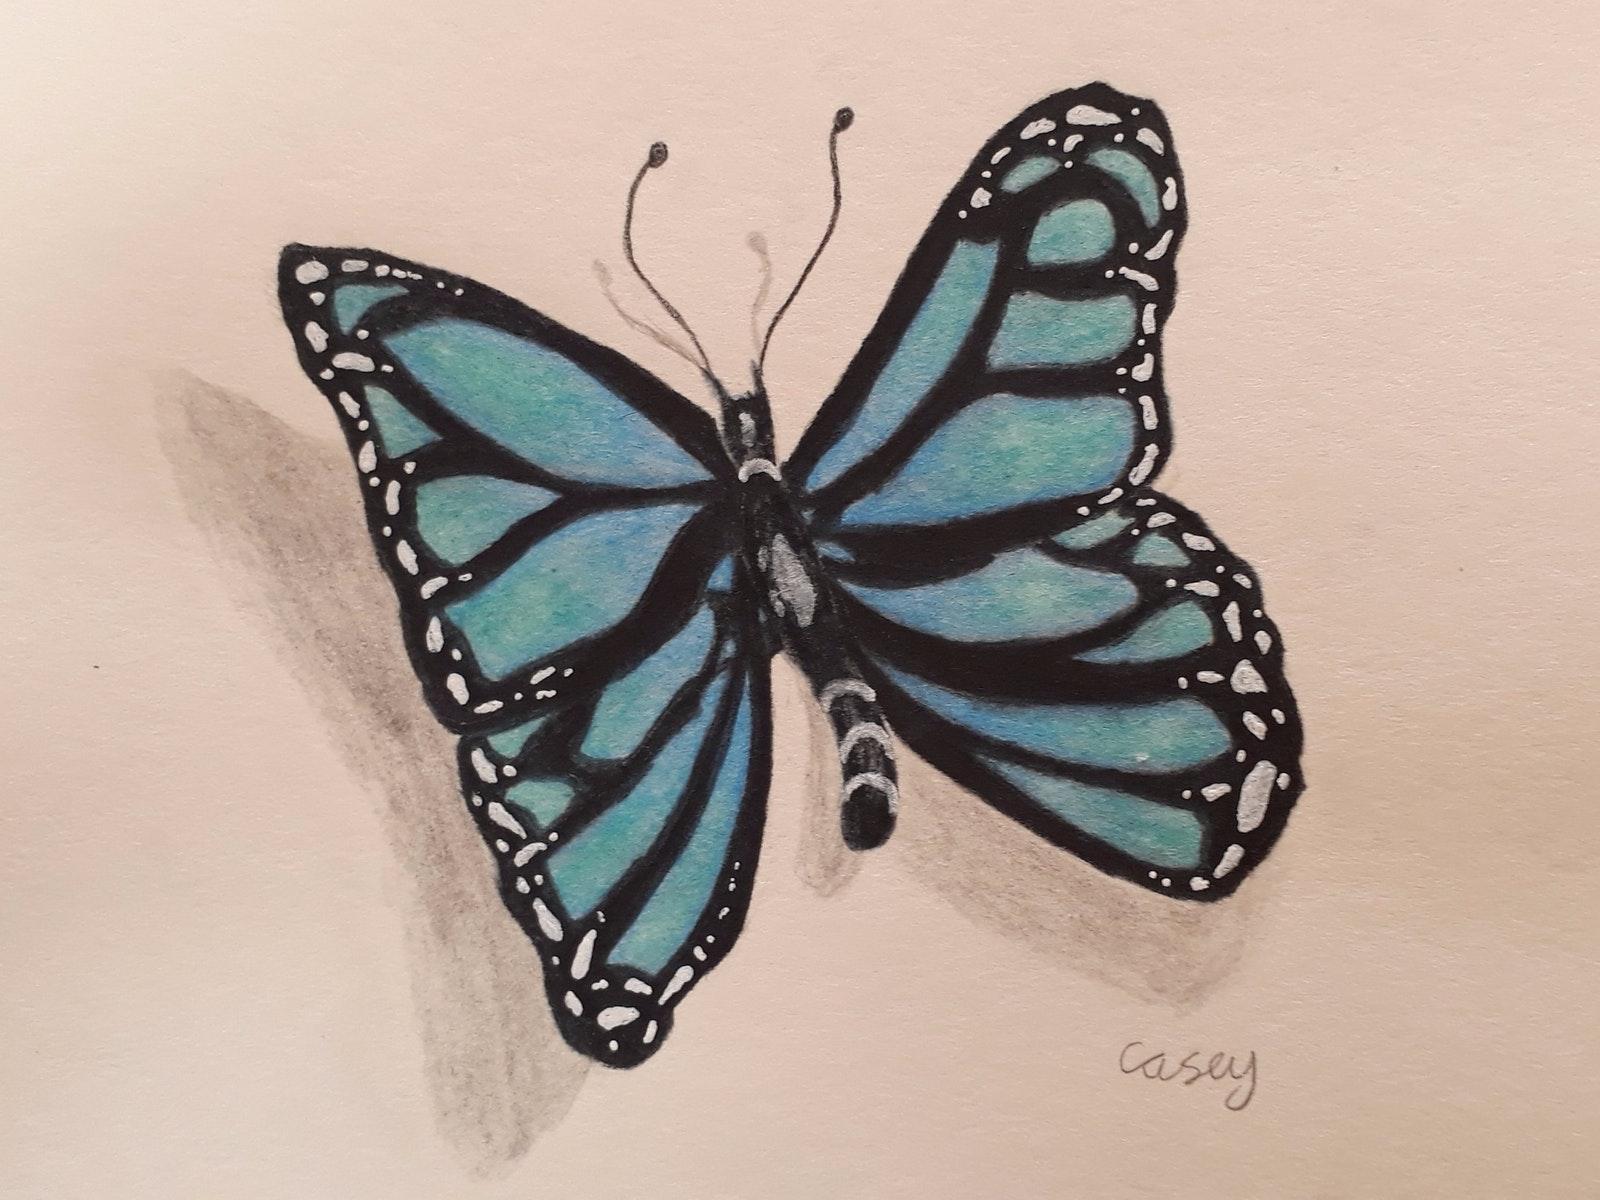 Butterfly by Casey Jeynes